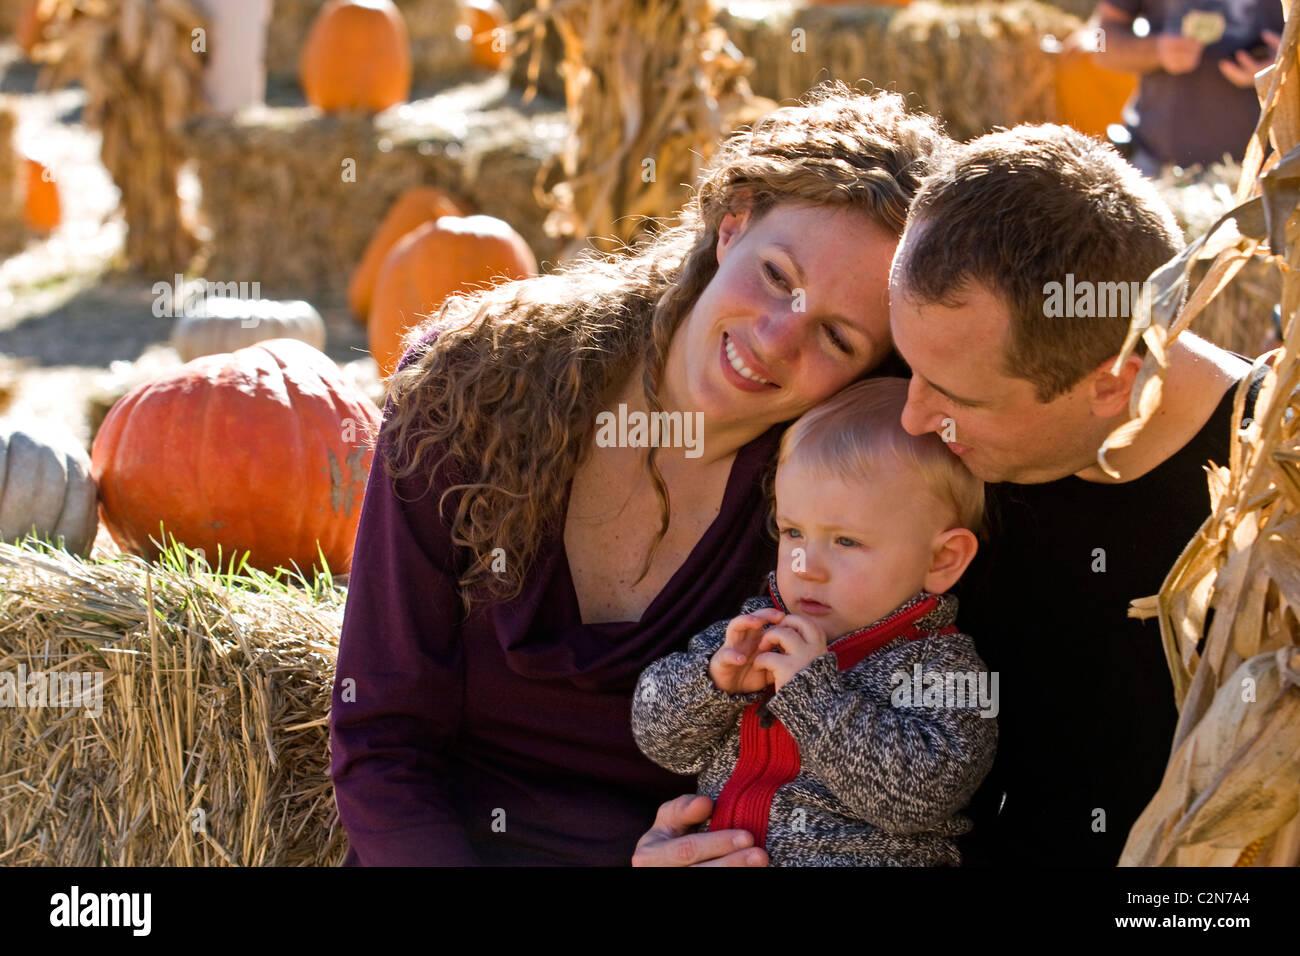 A family enjoying itself at a pumpkin patch. - Stock Image